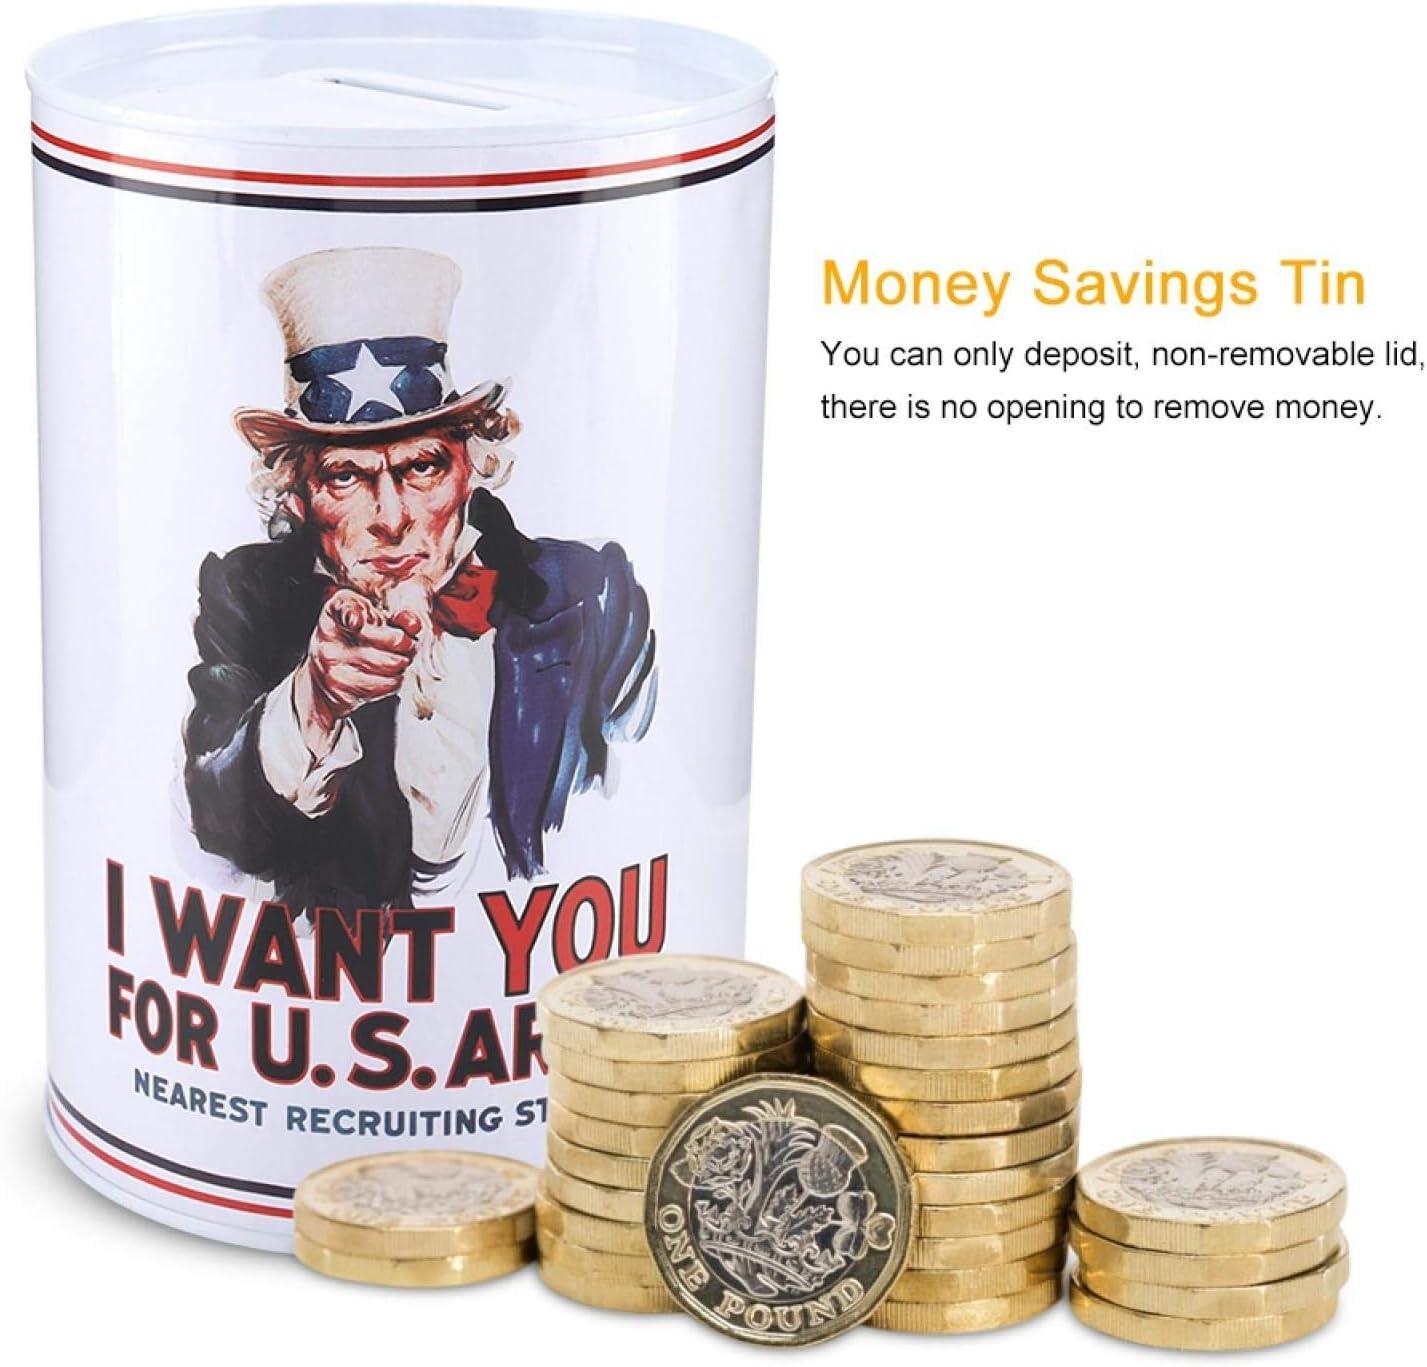 2312-03 Omabeta 1Pc Money Savings Tin Antique European-Style Tinplate Piggy Bank Creative Change Bank Decoration Piggy Bank Money Box Jar for Kids Adults